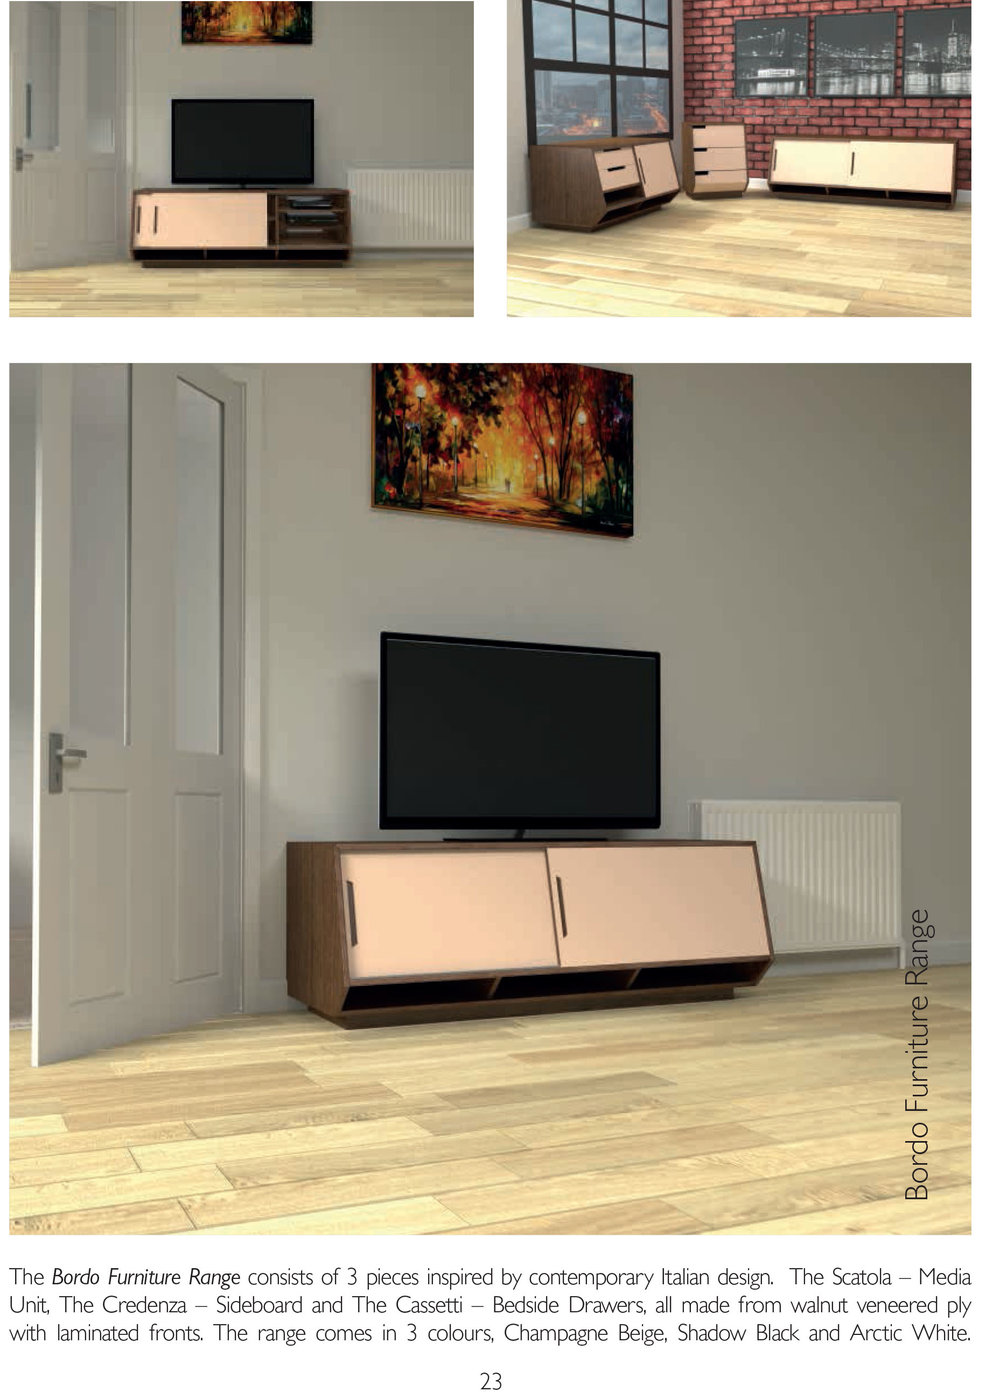 Furniture Product Design   Brochure   NTU Degree Show 2017 25 jpg. BA Furniture   Product Design Brochure 2017   NTU Design Industries